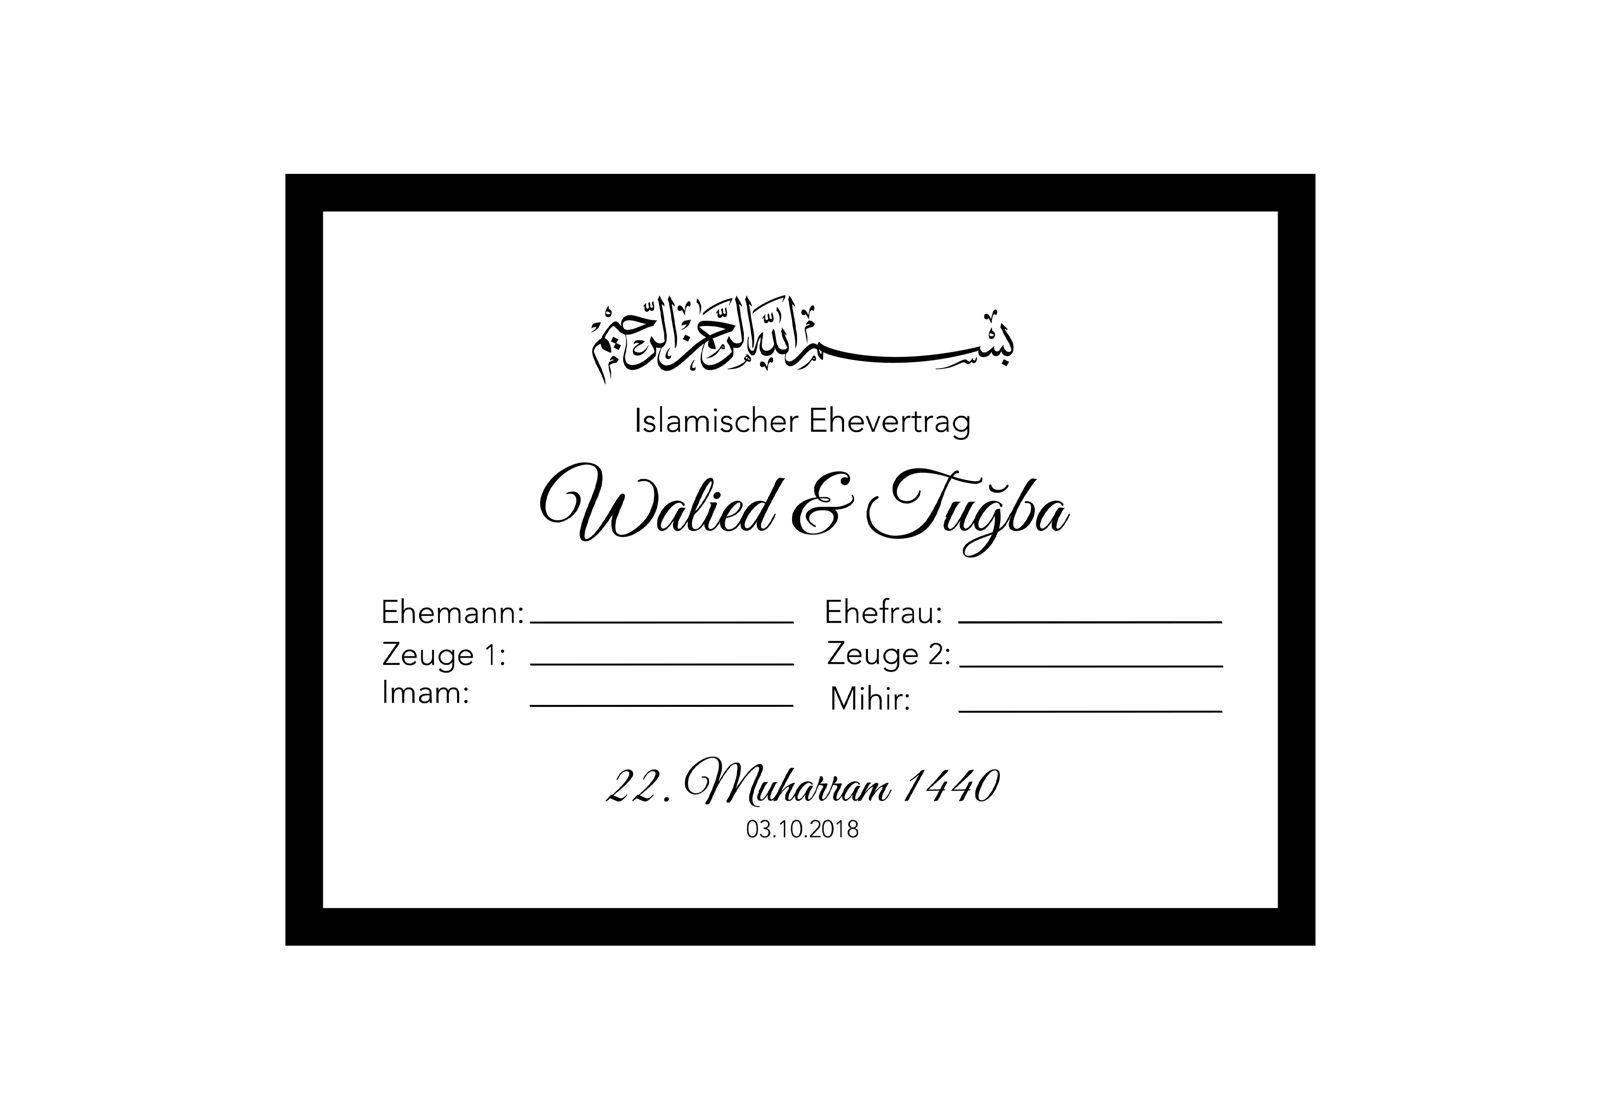 Islamischer Ehevertrag_opt